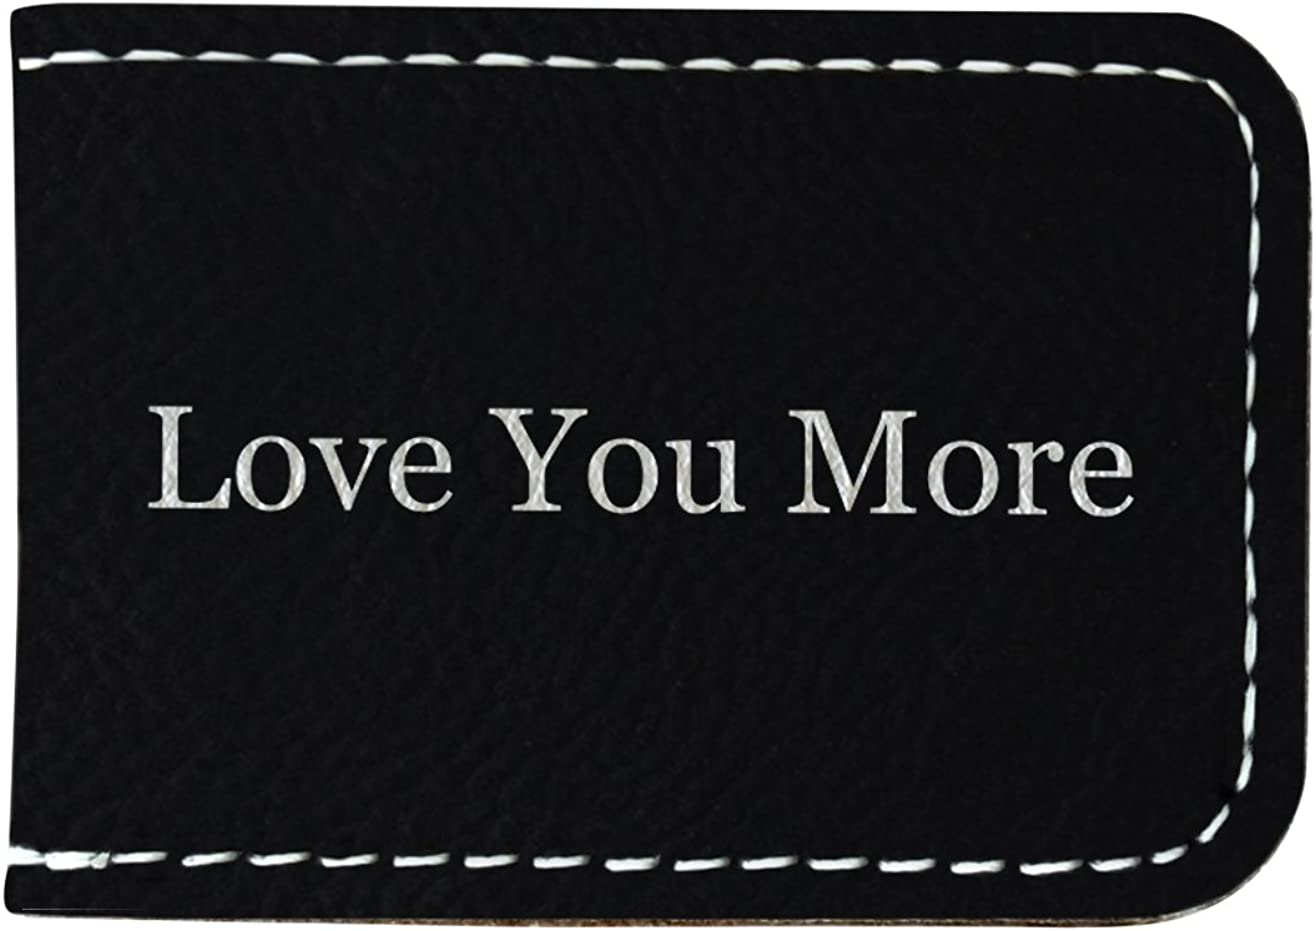 Phi Sigma Kappa Leatherette New Money Clip